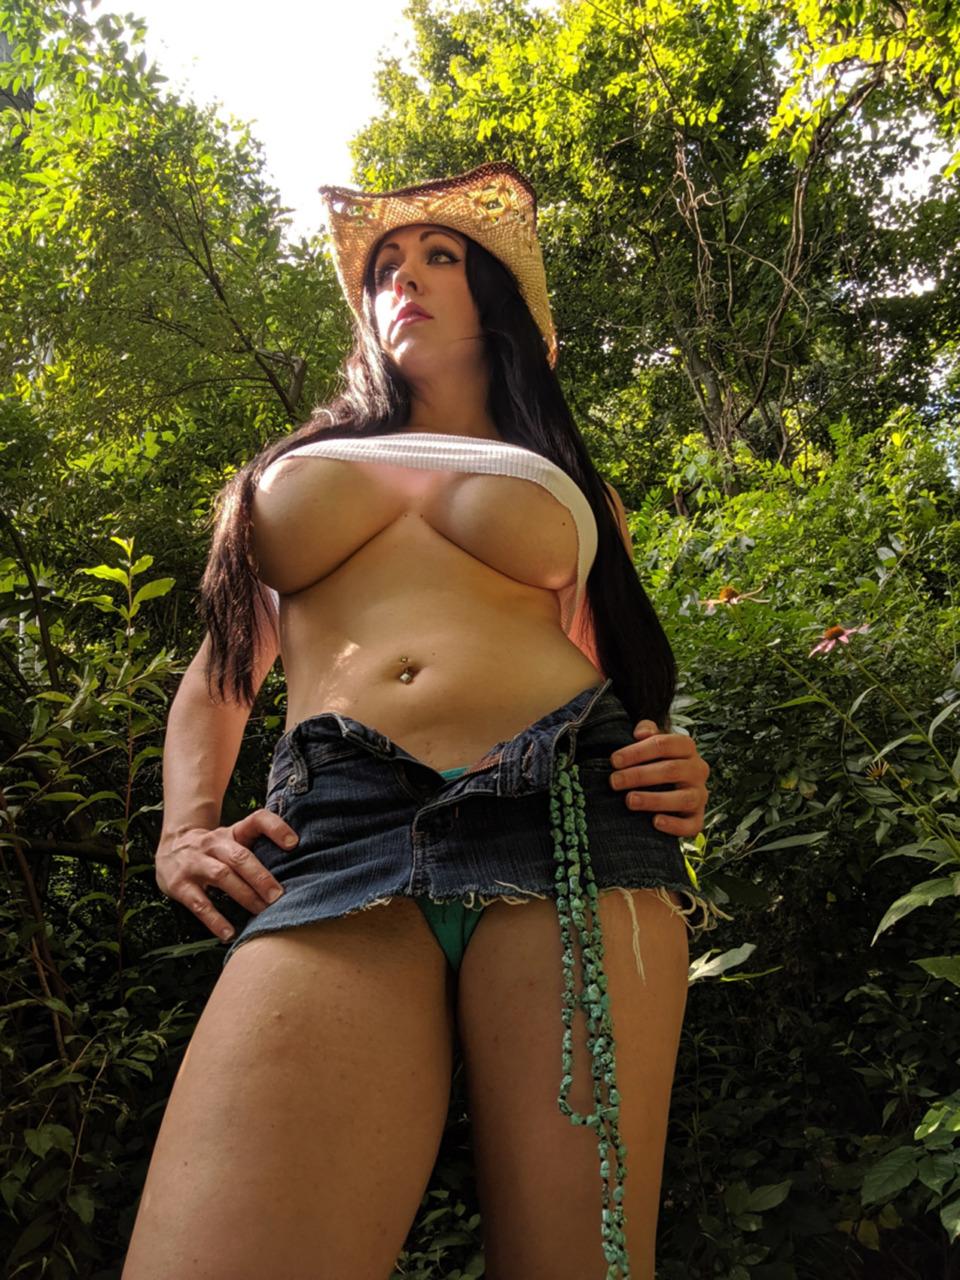 Kayla Kiss - The Busty Cowgirl 7